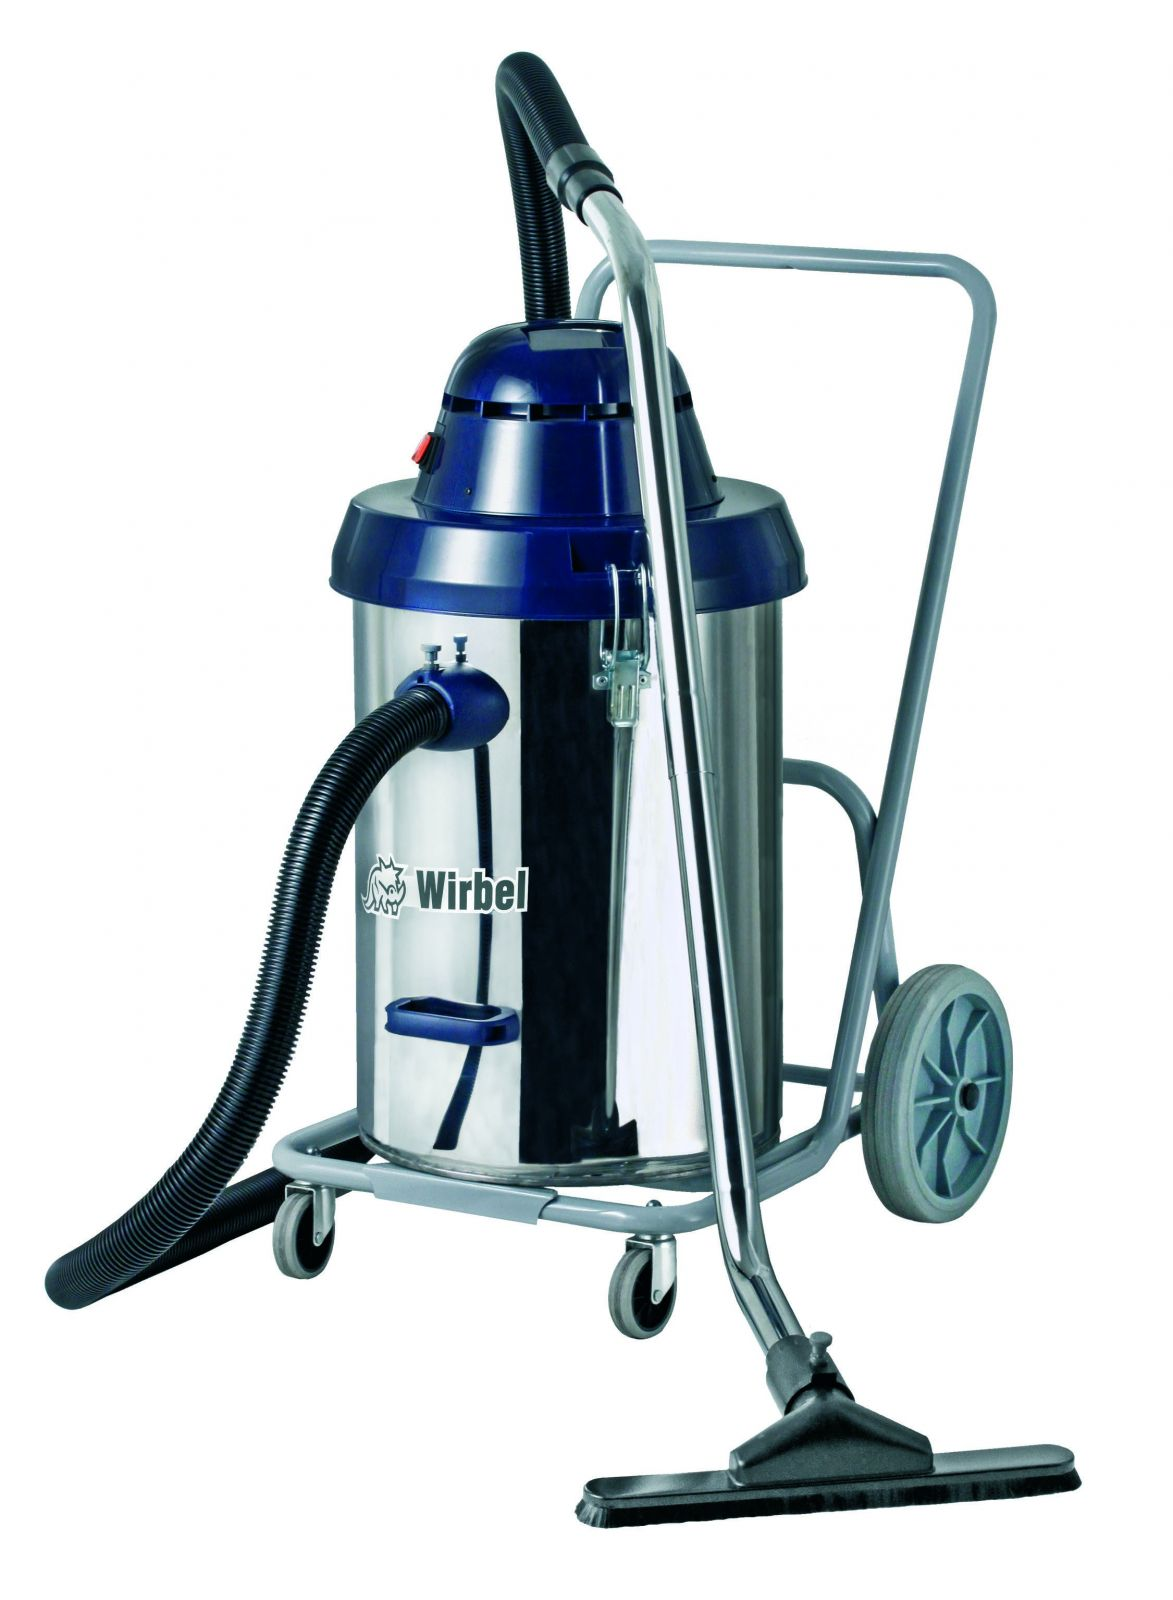 935 Inox Wet & Dry Vacuum with Castors